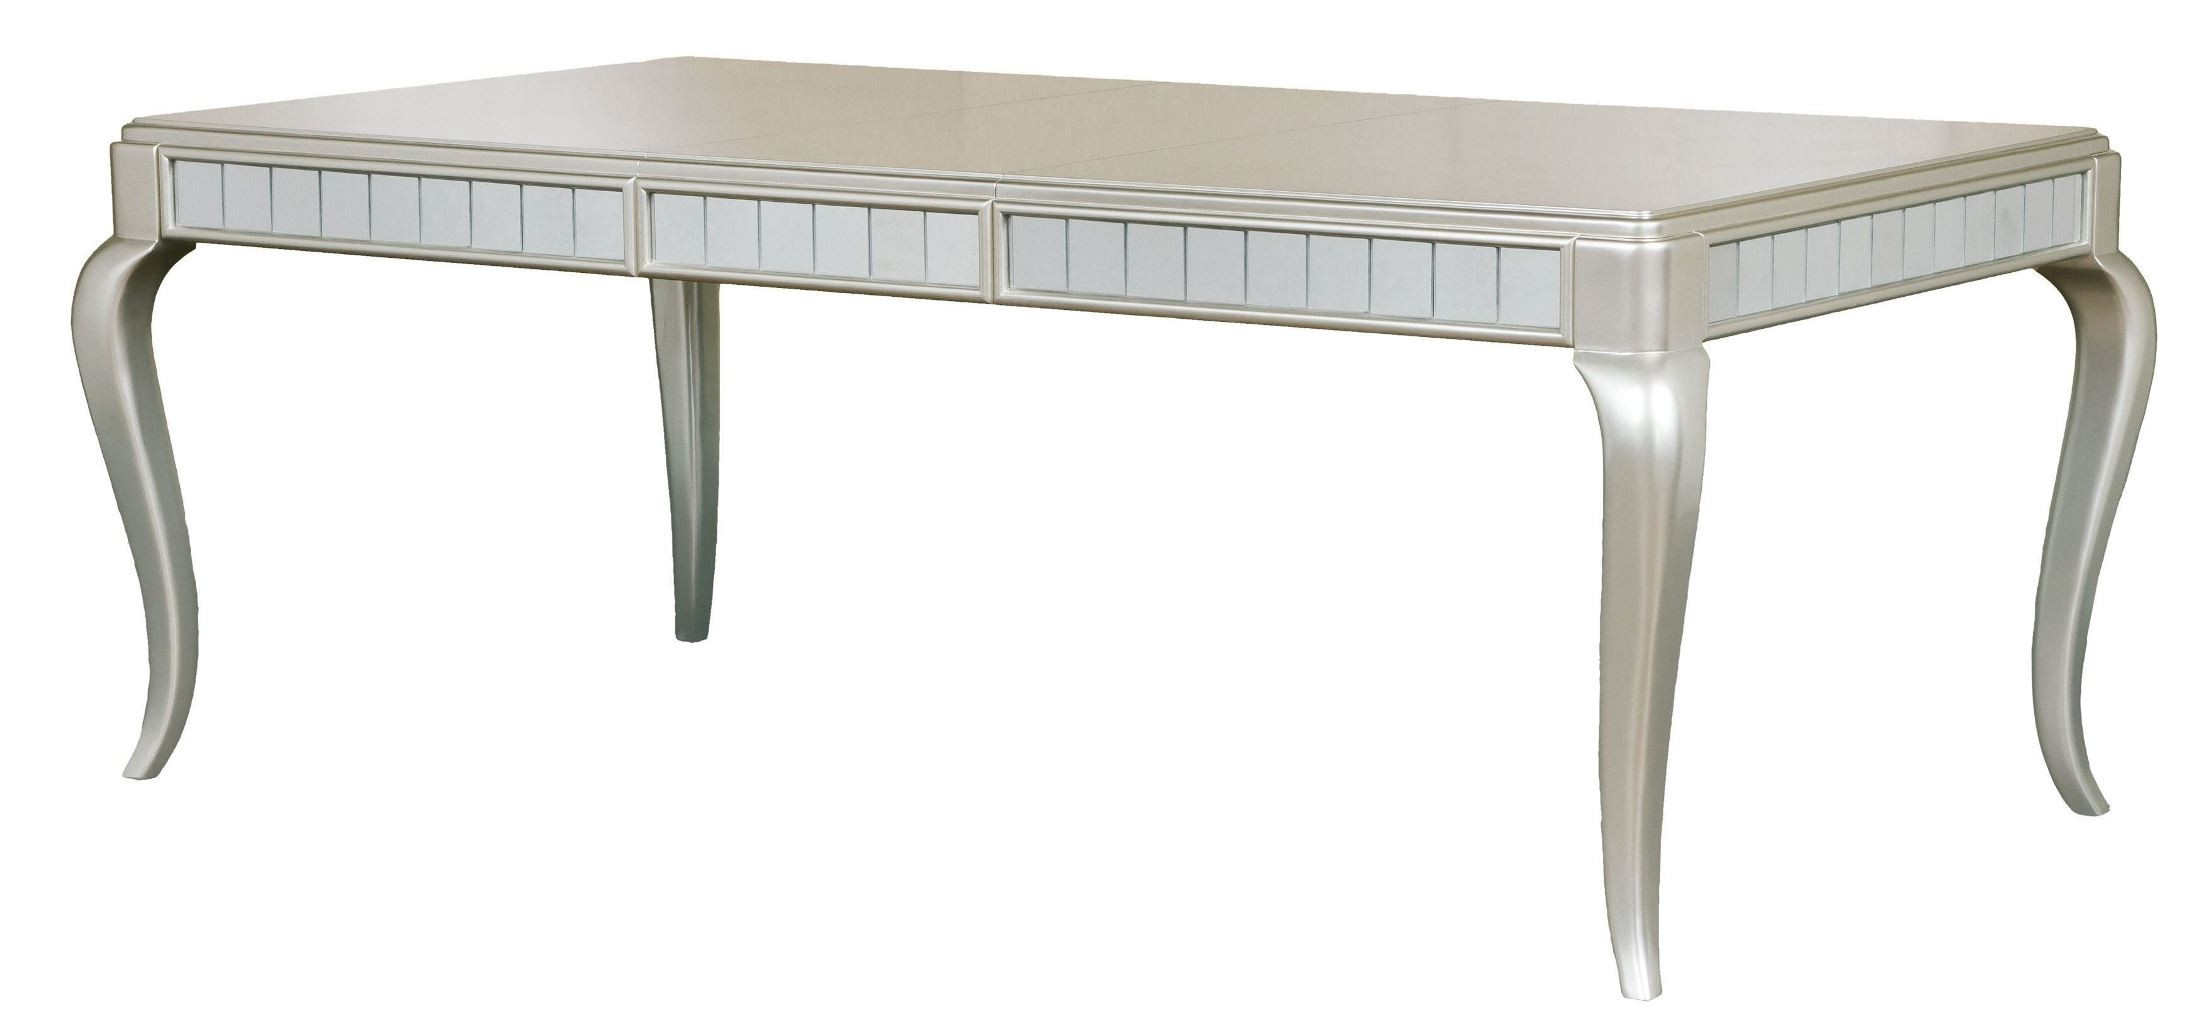 diva metallic rectangular extendable leg dining table from